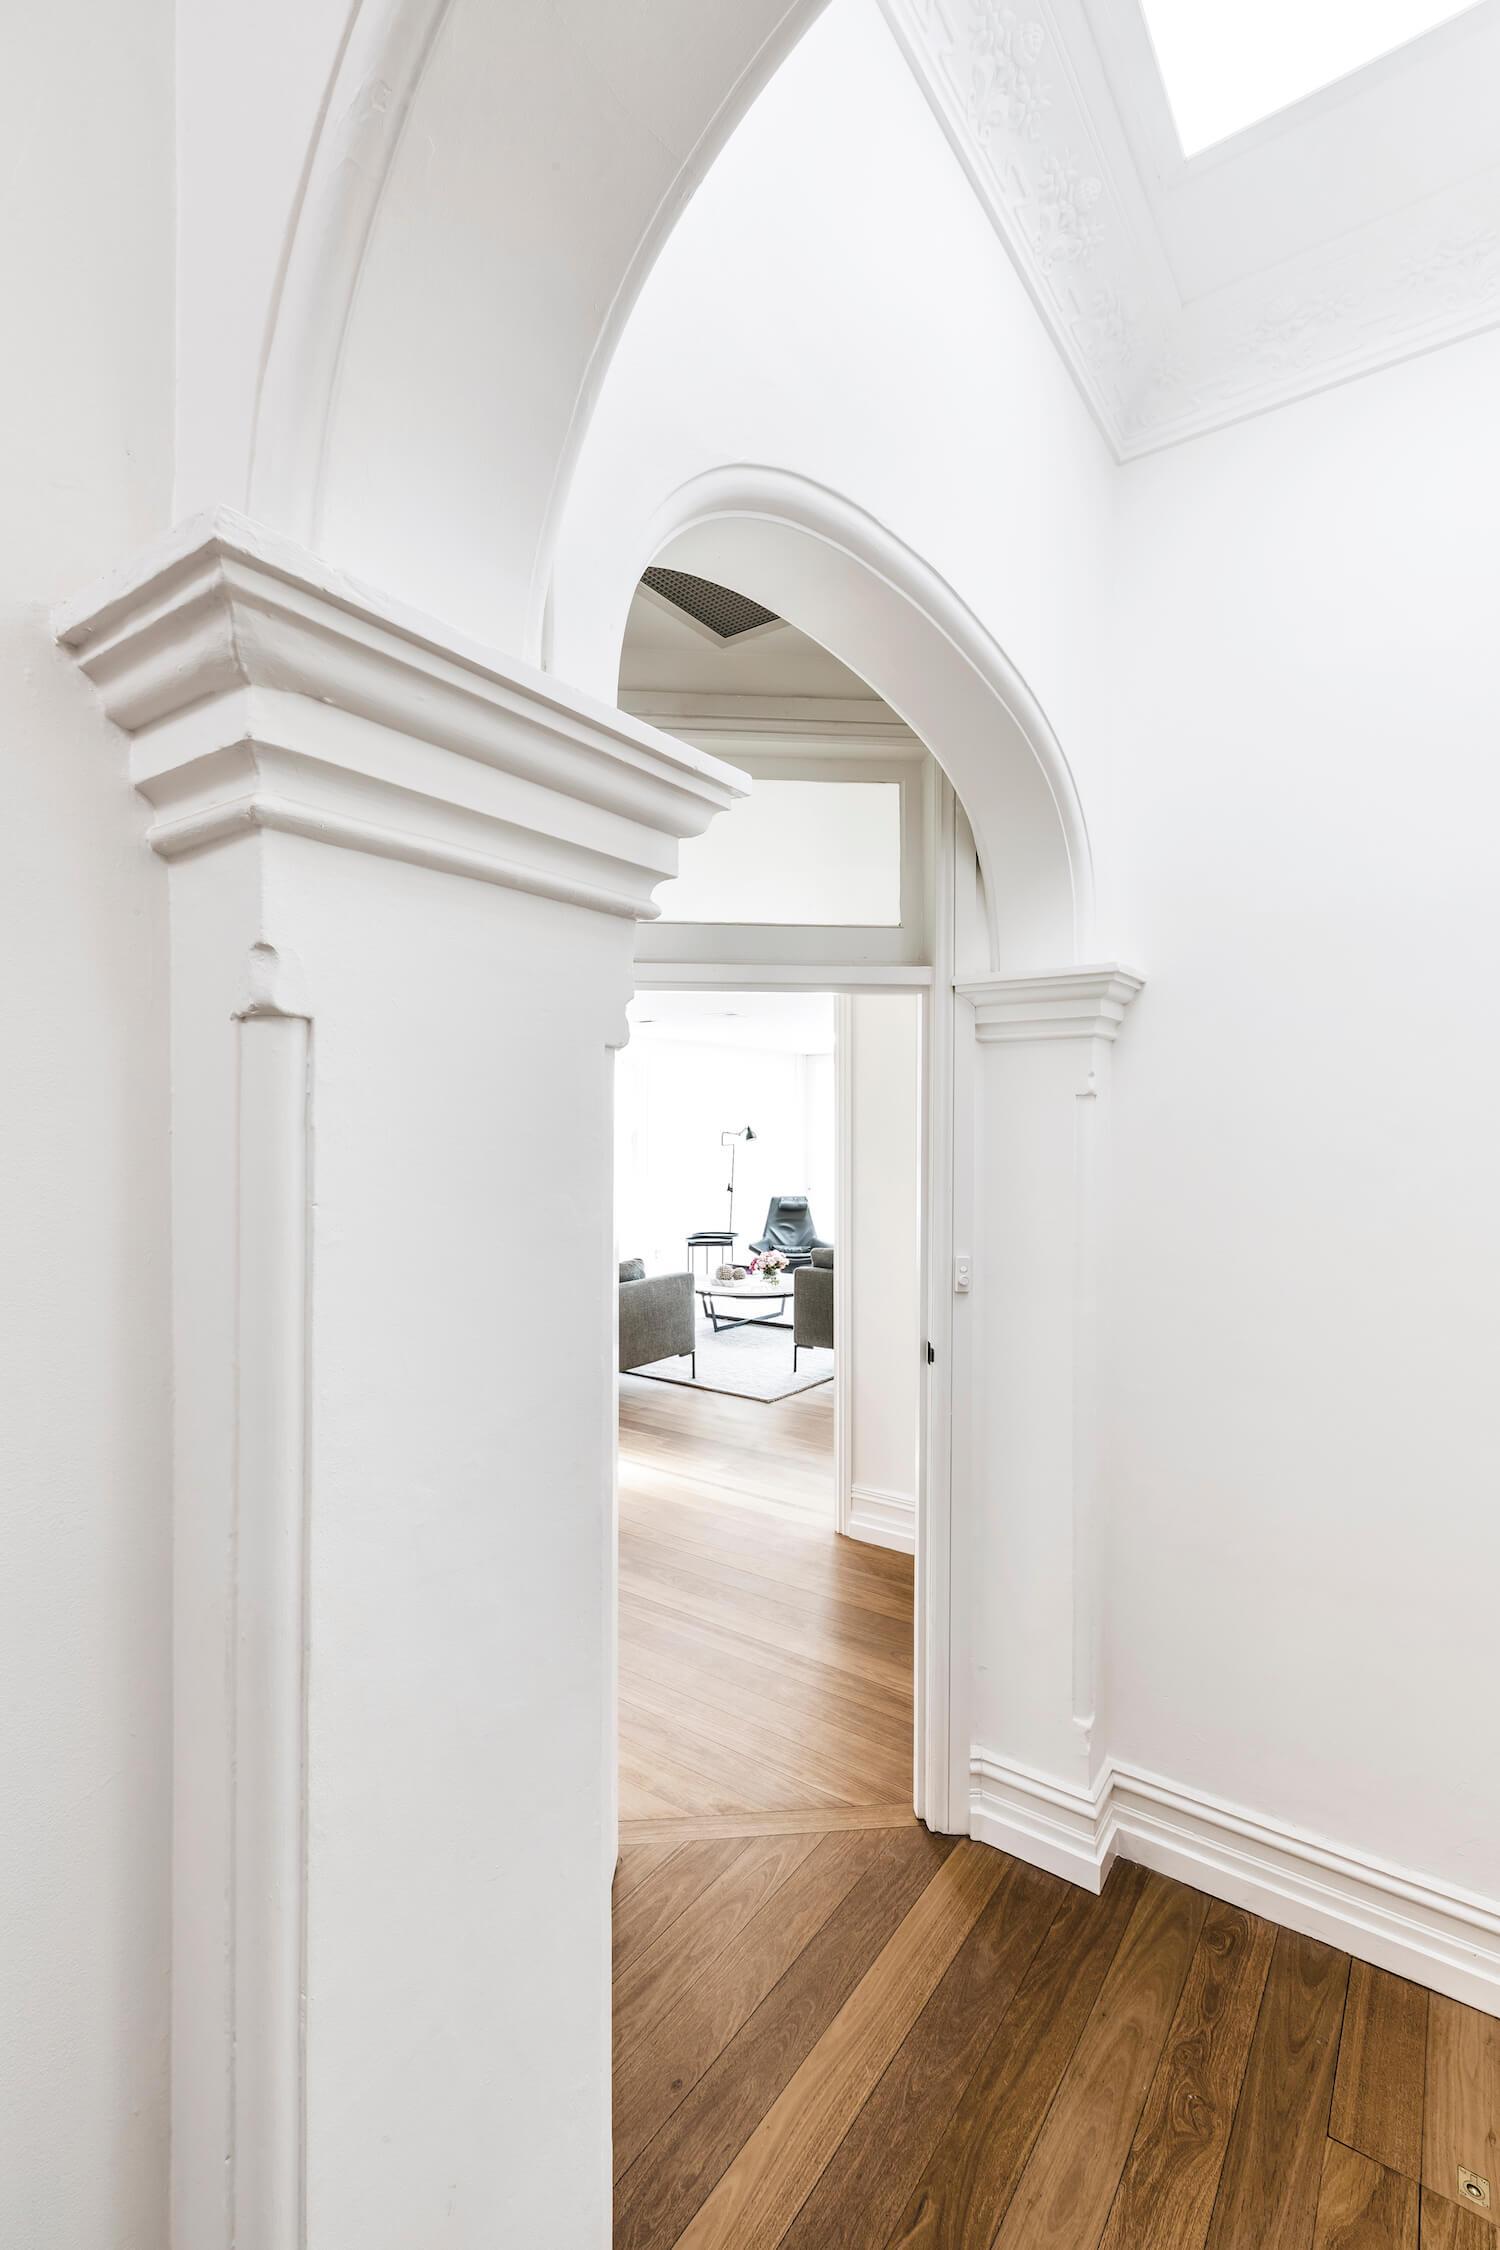 est living australian interiors bellevue hill house madeleine blanchfield architects 8